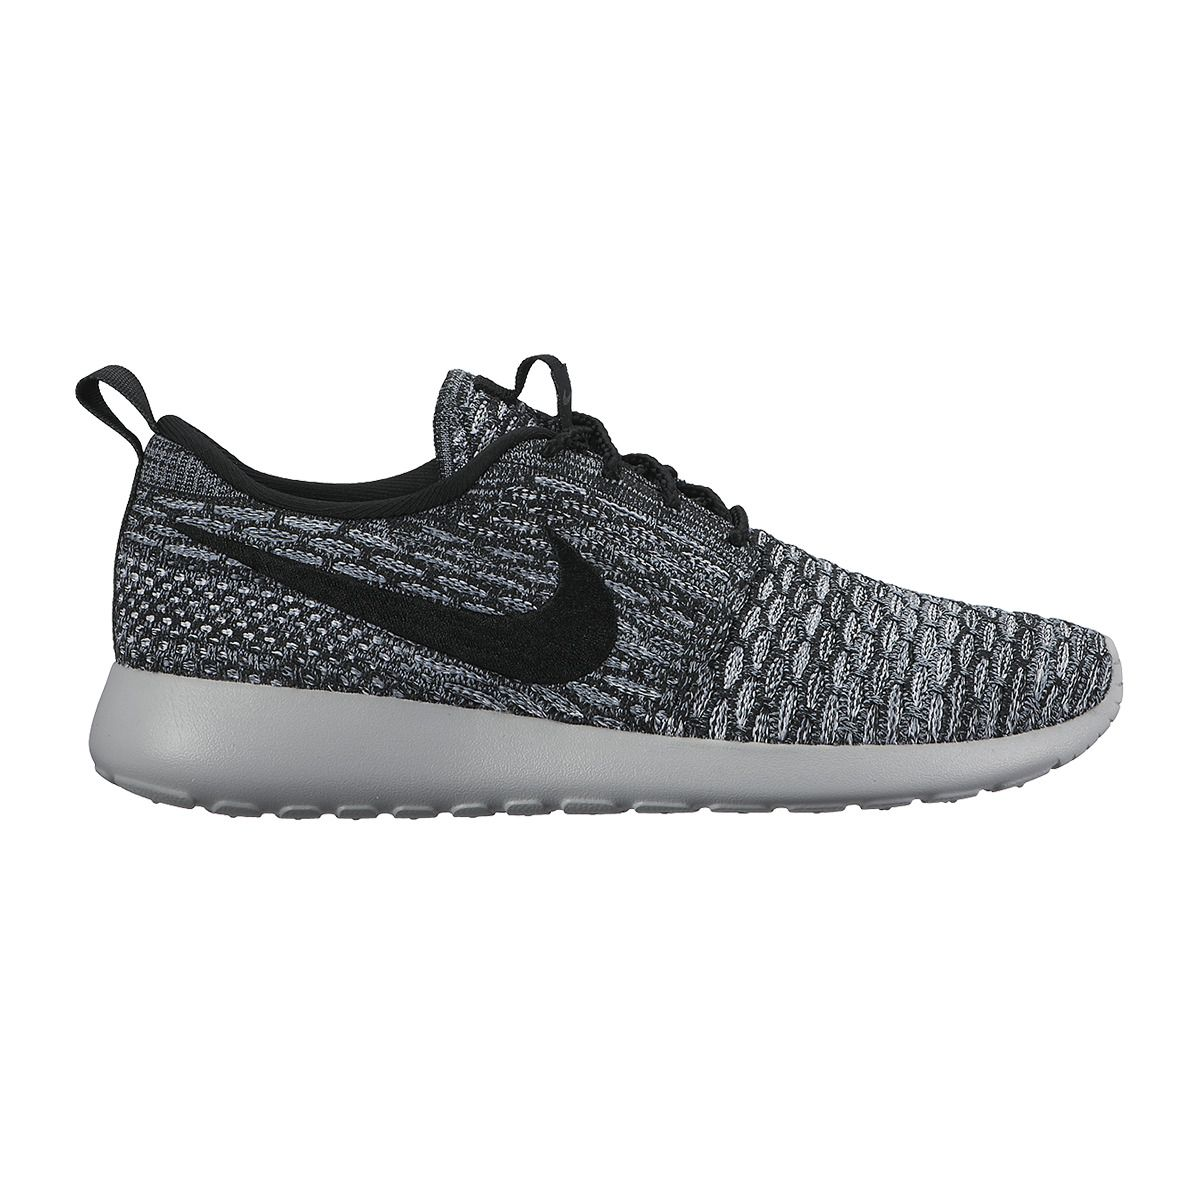 brand new 457fc 0d23a Zapatillas casual de mujer Roshe One Flyknit Nike